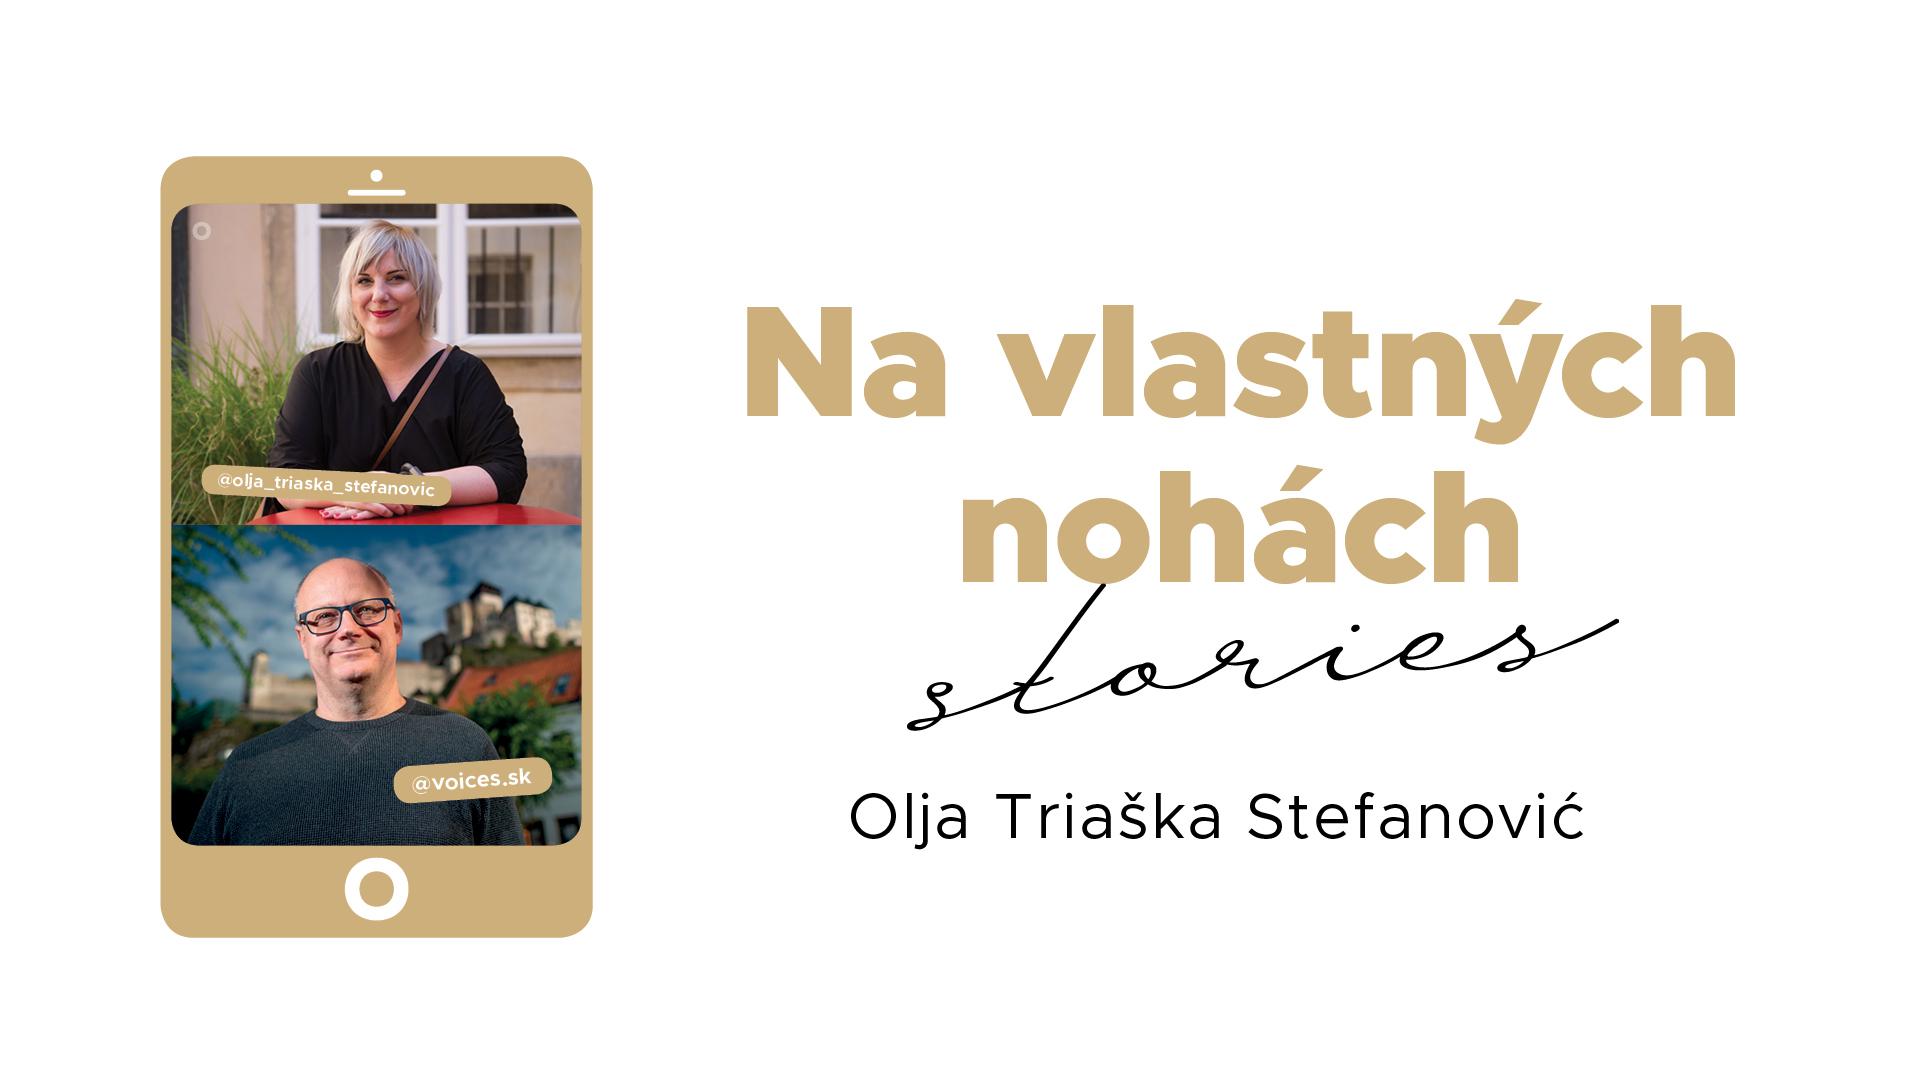 ilustračný obrázok_Olja Triaška Stefanovic